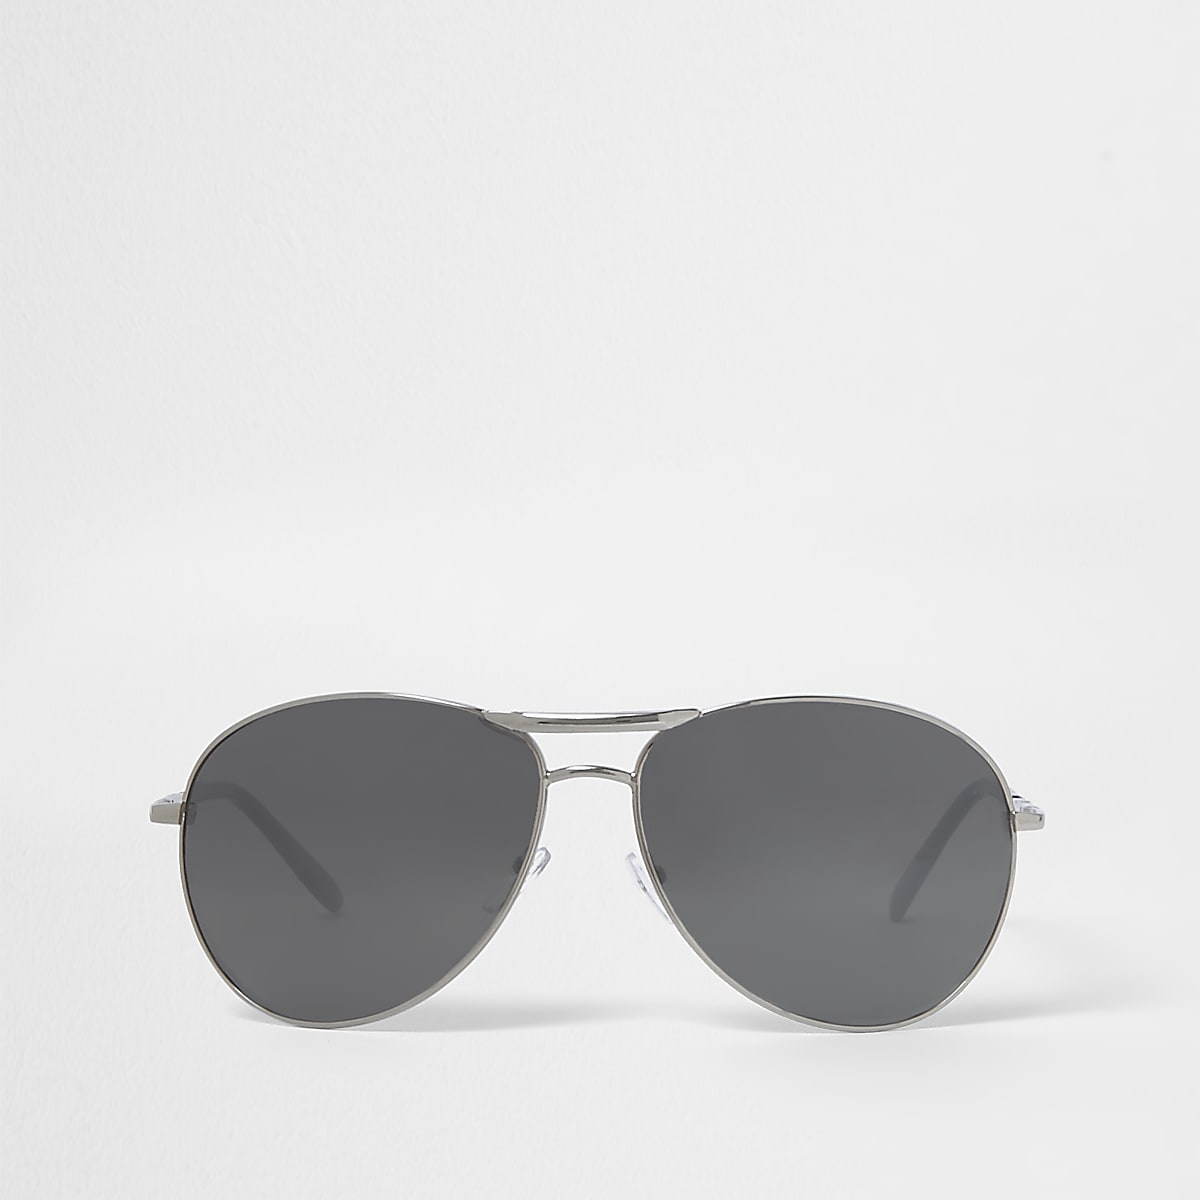 0e5091a70b01f5 Zilverkleurige pilotenzonnebril met spiegelglazen Zilverkleurige  pilotenzonnebril met spiegelglazen ...